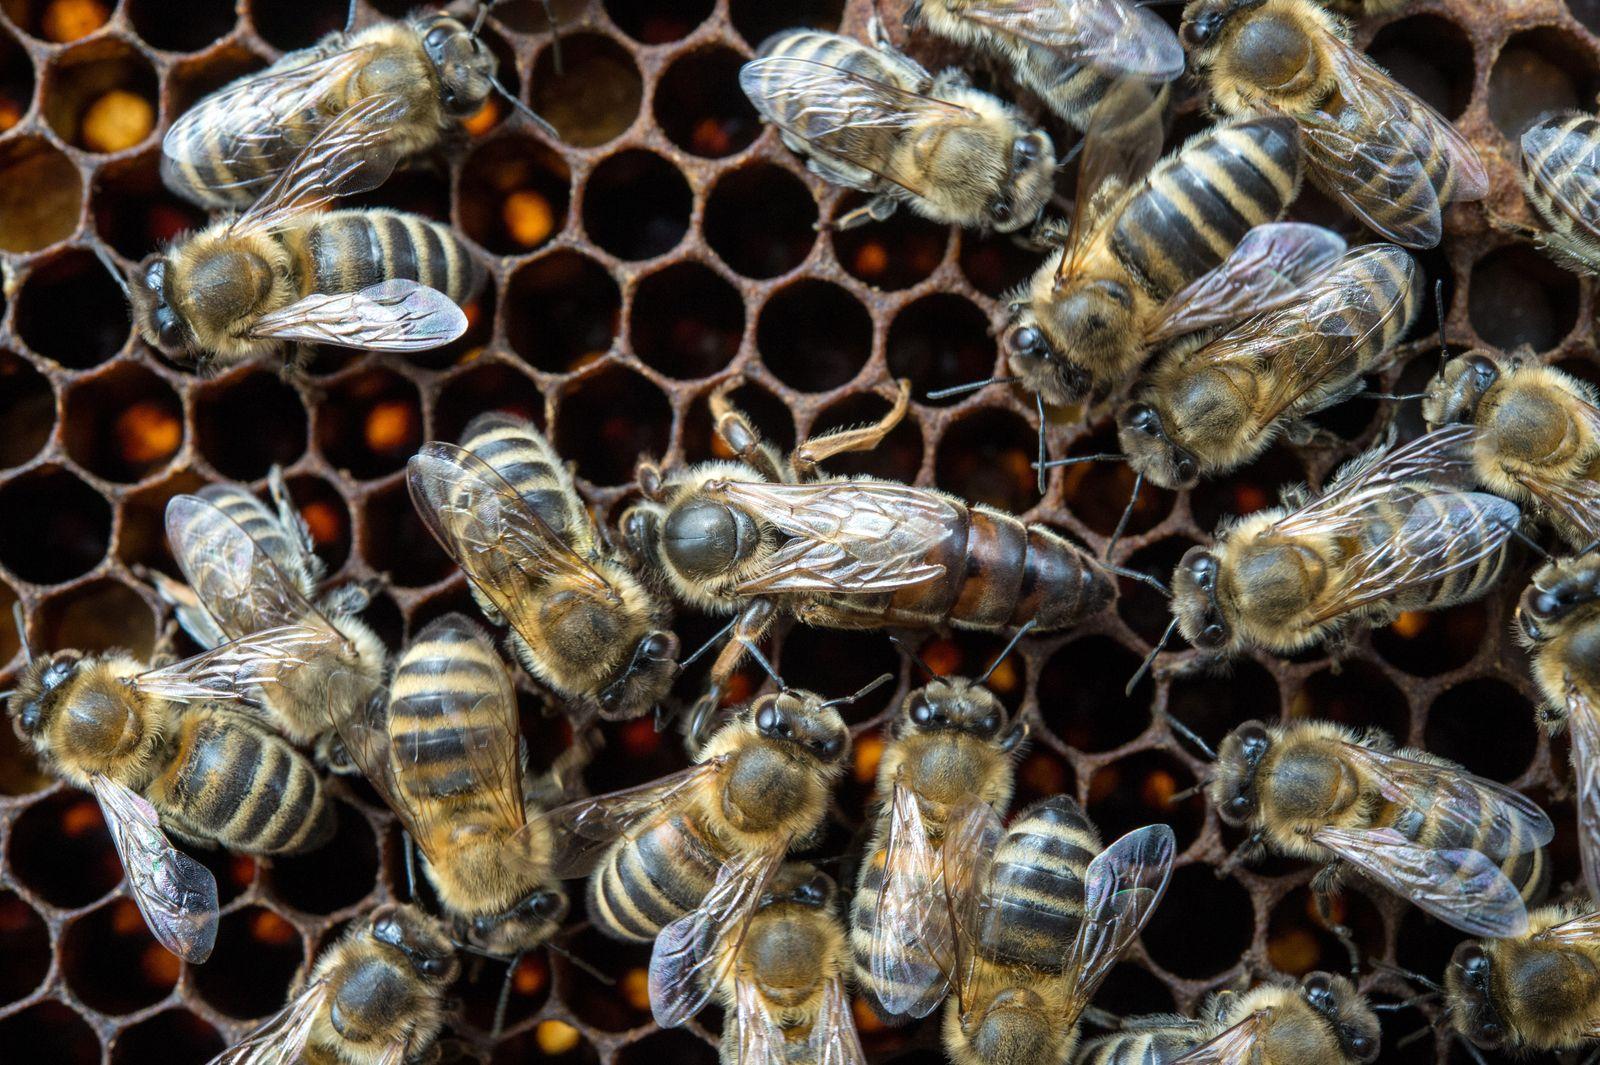 Australiens Bienenimporte wegen Coronapandemie in Gefahr